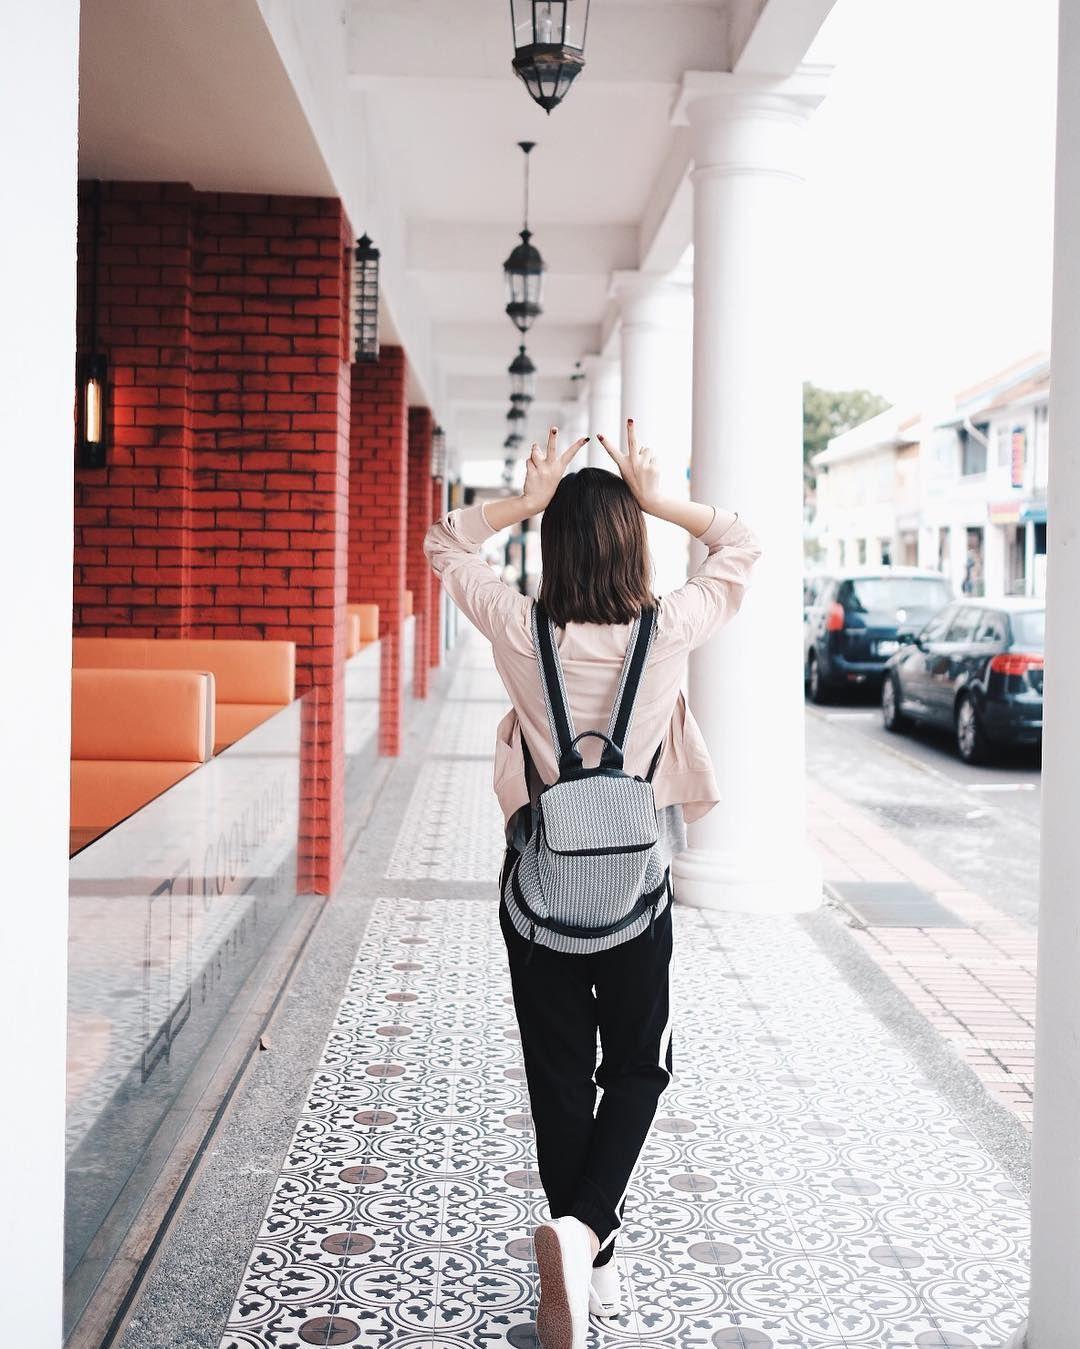 Likes Comments Ko Ling 高海寧 sammkoling on Instagram